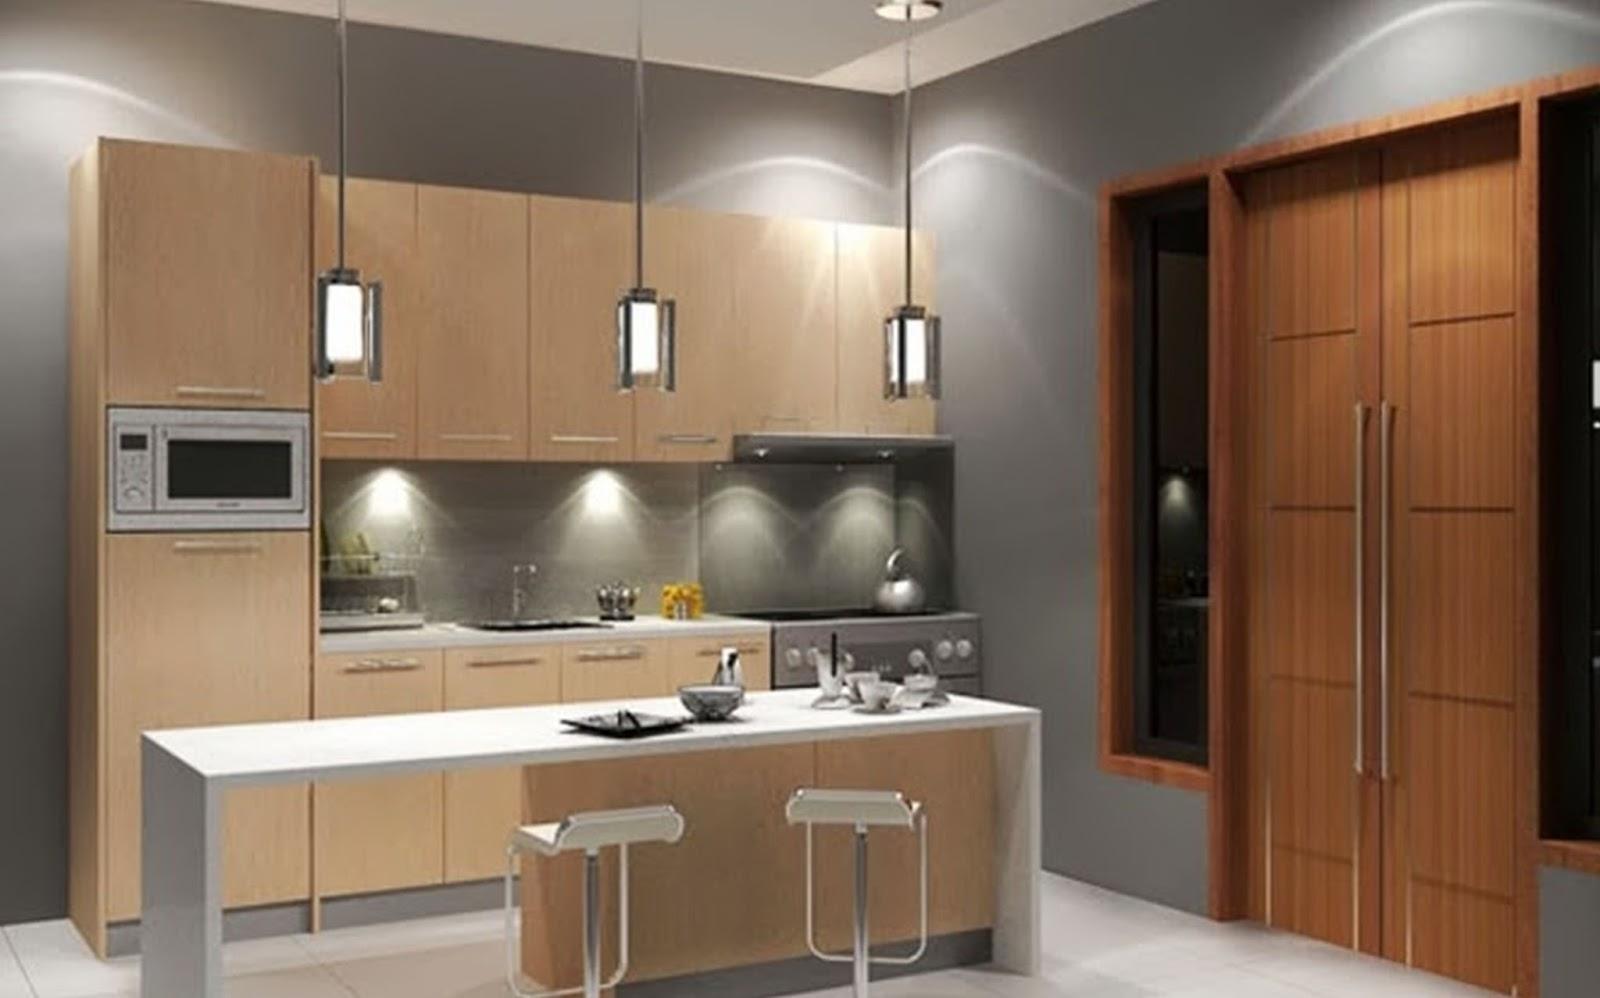 Kitchen Furniture And Interior Design Desktop Cabinets Software For Mobile Hd